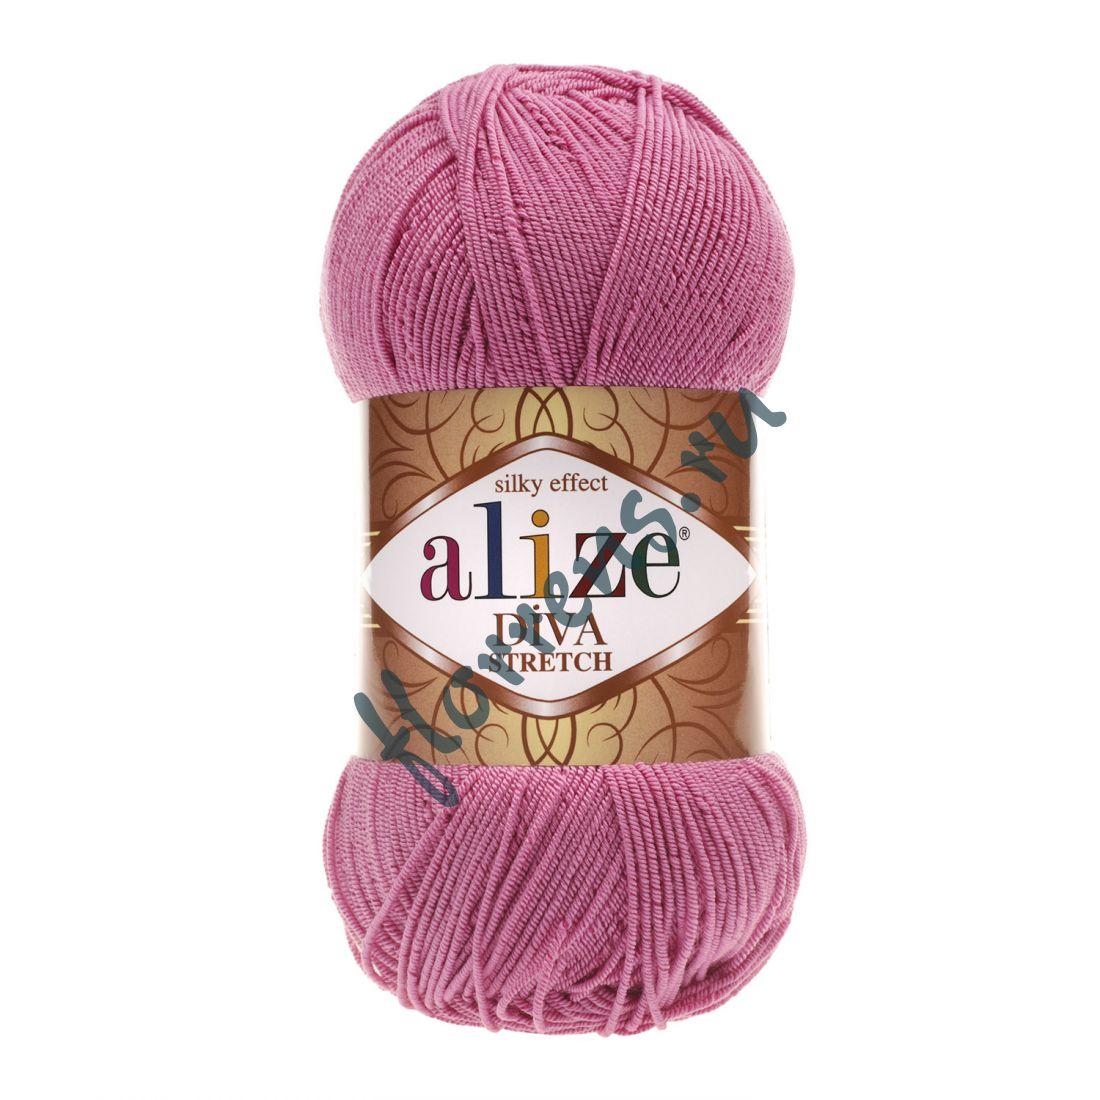 Пряжа Alize Diva Stretch / 178 ярко-розовый